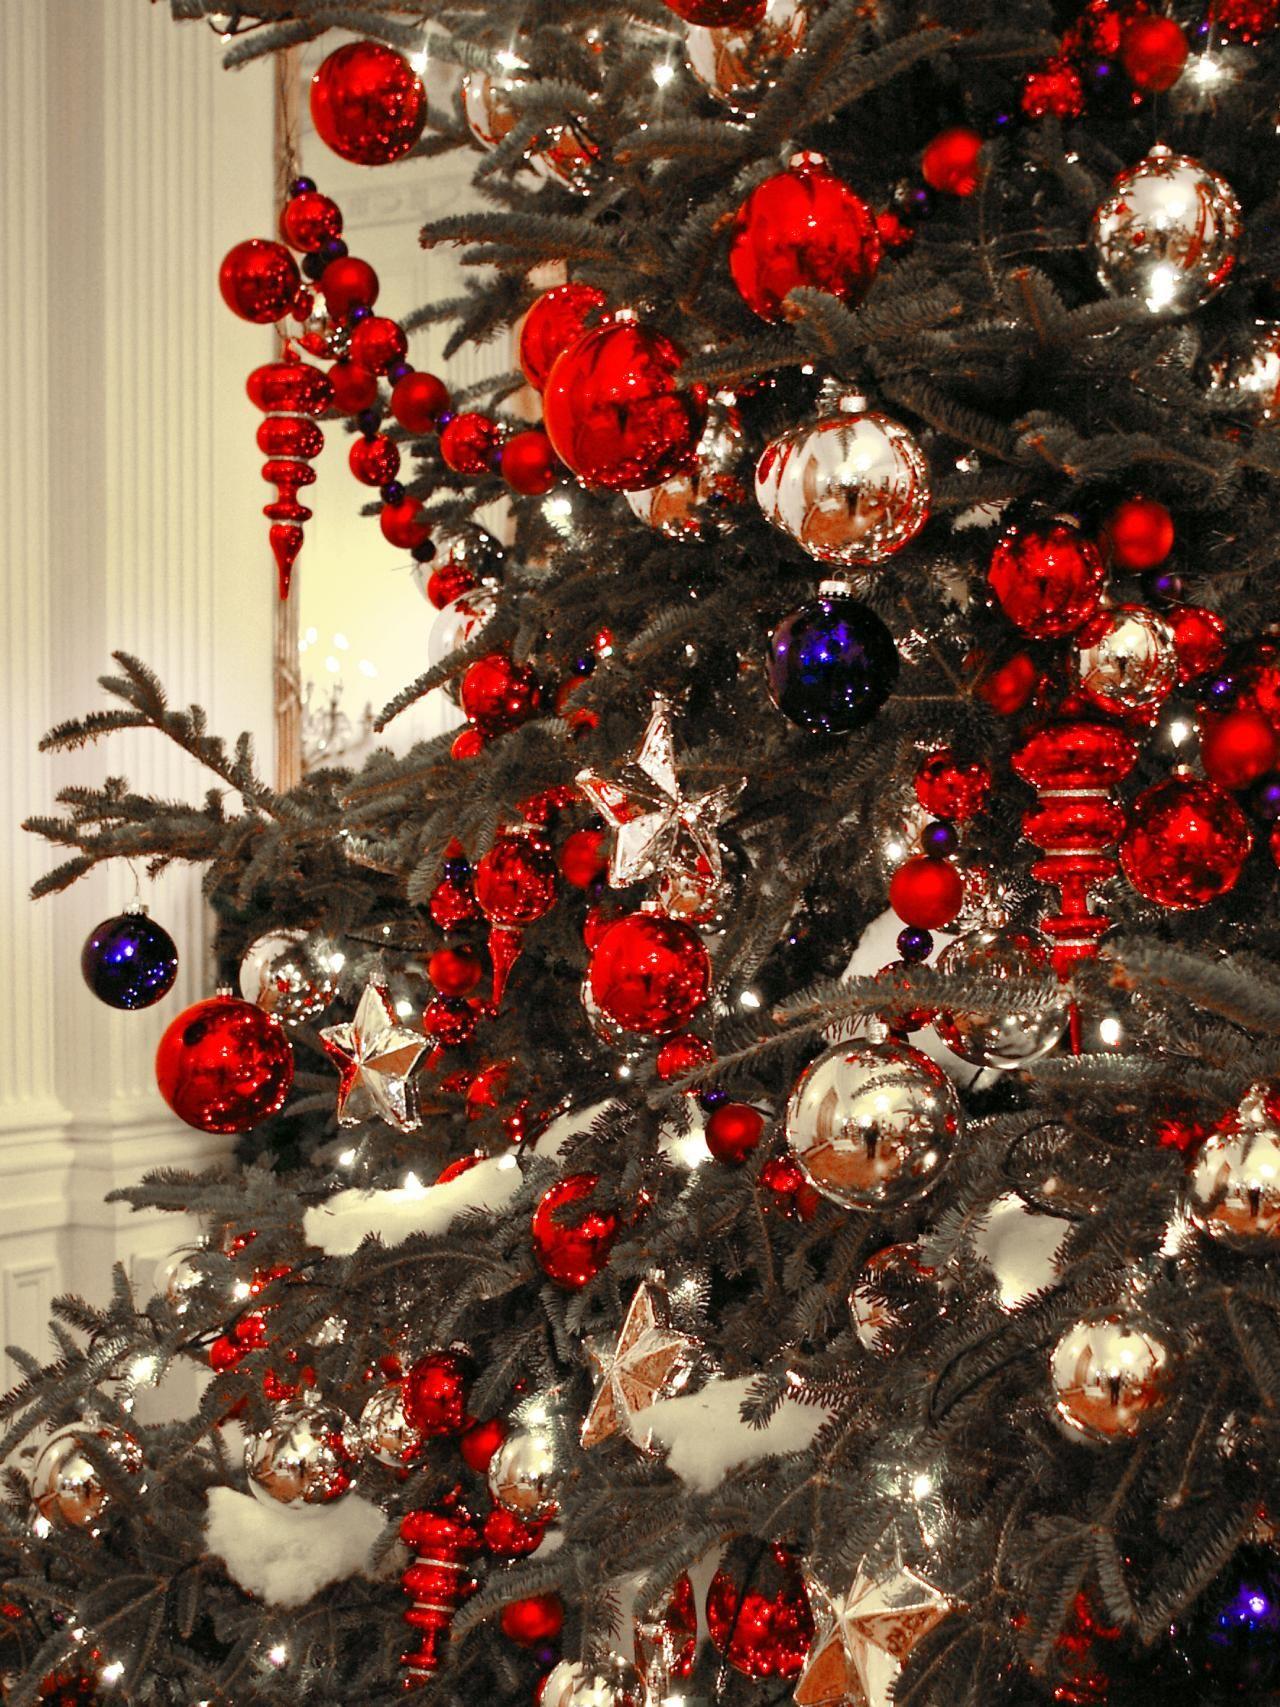 Christmas Tree Decorating Ideas Patriotic Christmas Tree Unusual Christmas Trees Gold Christmas Tree Decorations